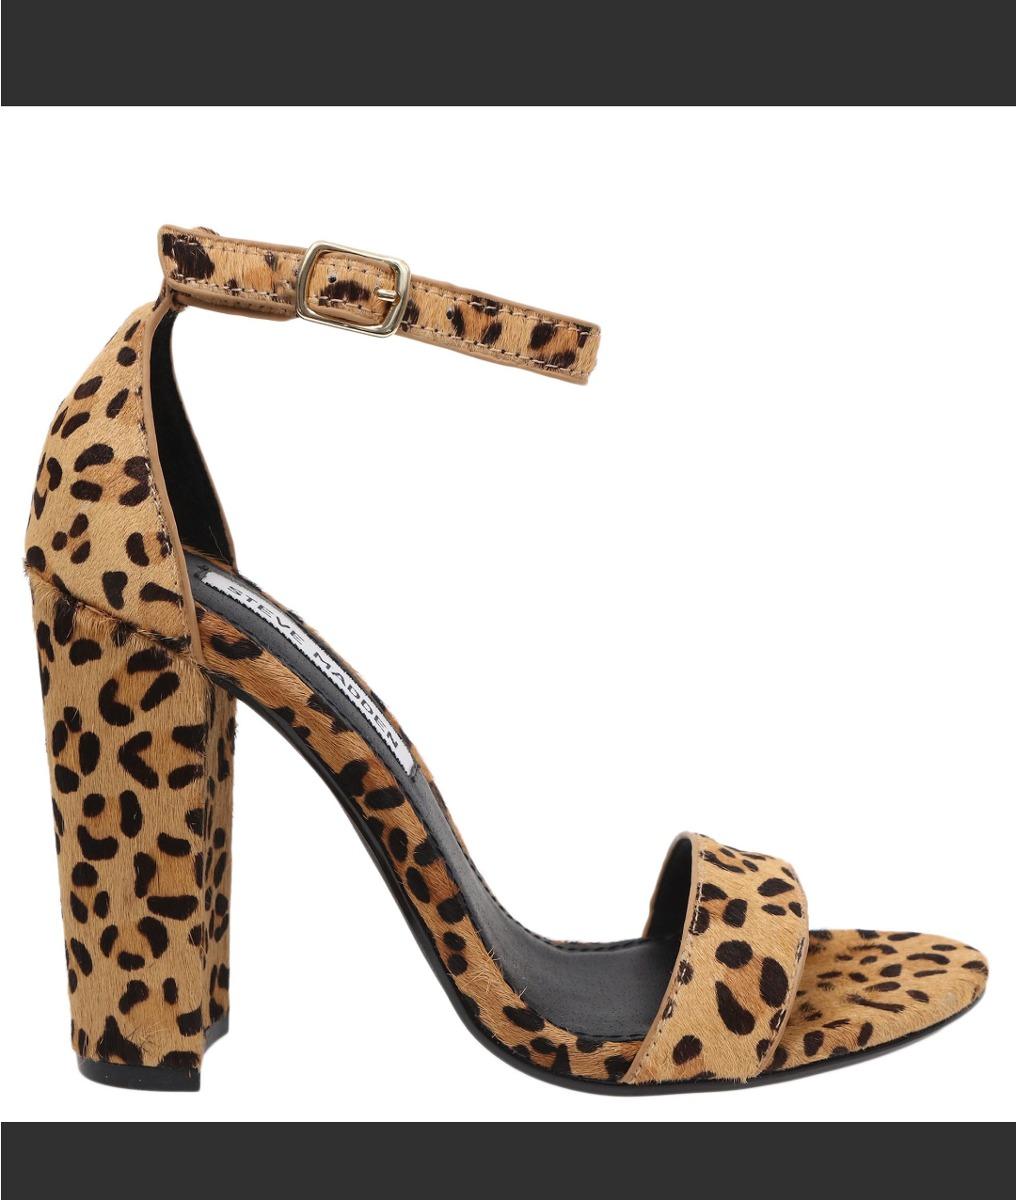 2adb8d84f5d Zapatos Steve Madden Animal Print